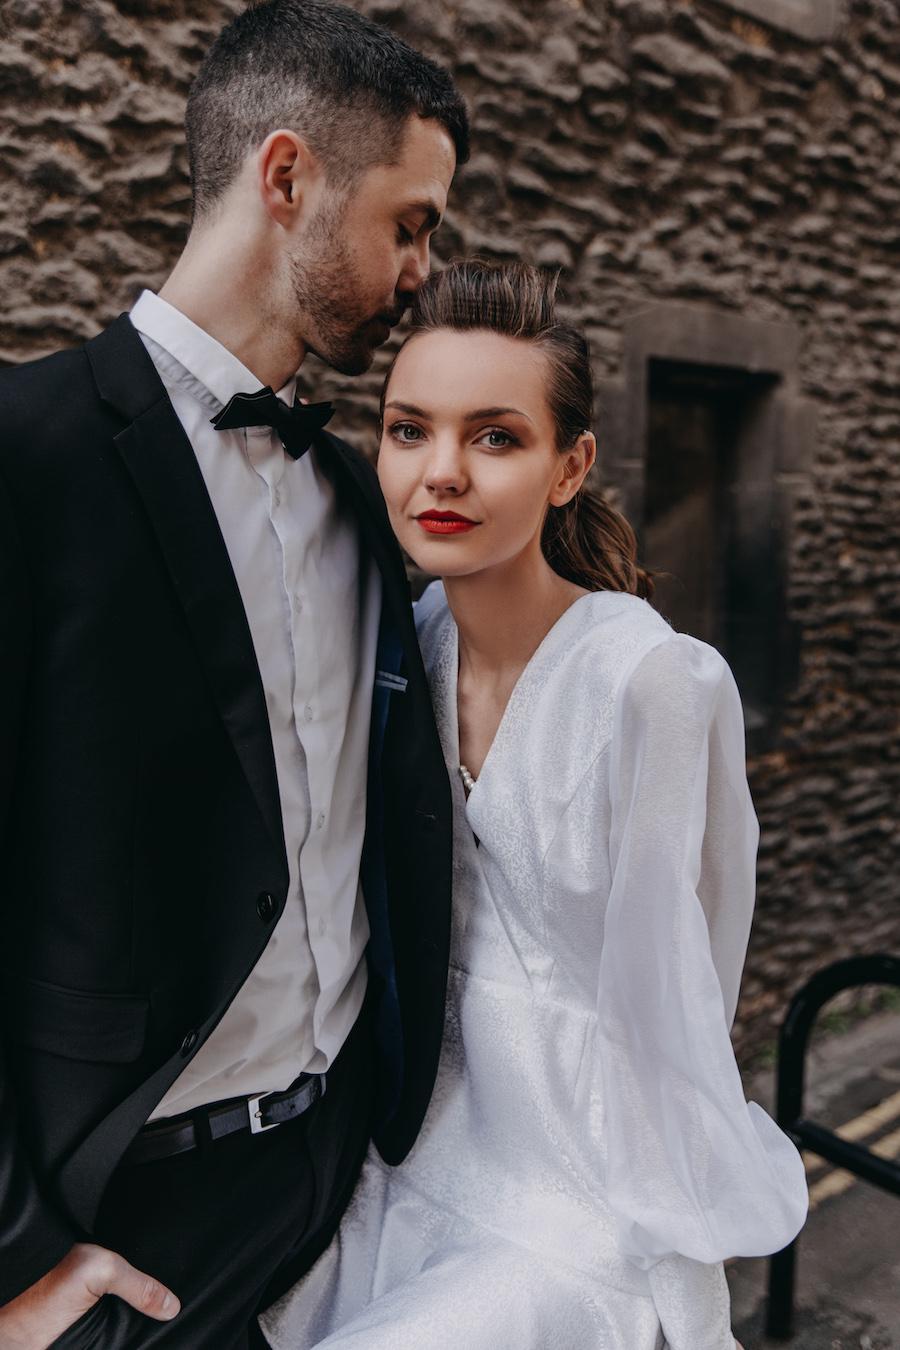 City-Wedding-In-Cambridge-Editorial-Shoot-Photography-Masha-Unworth-